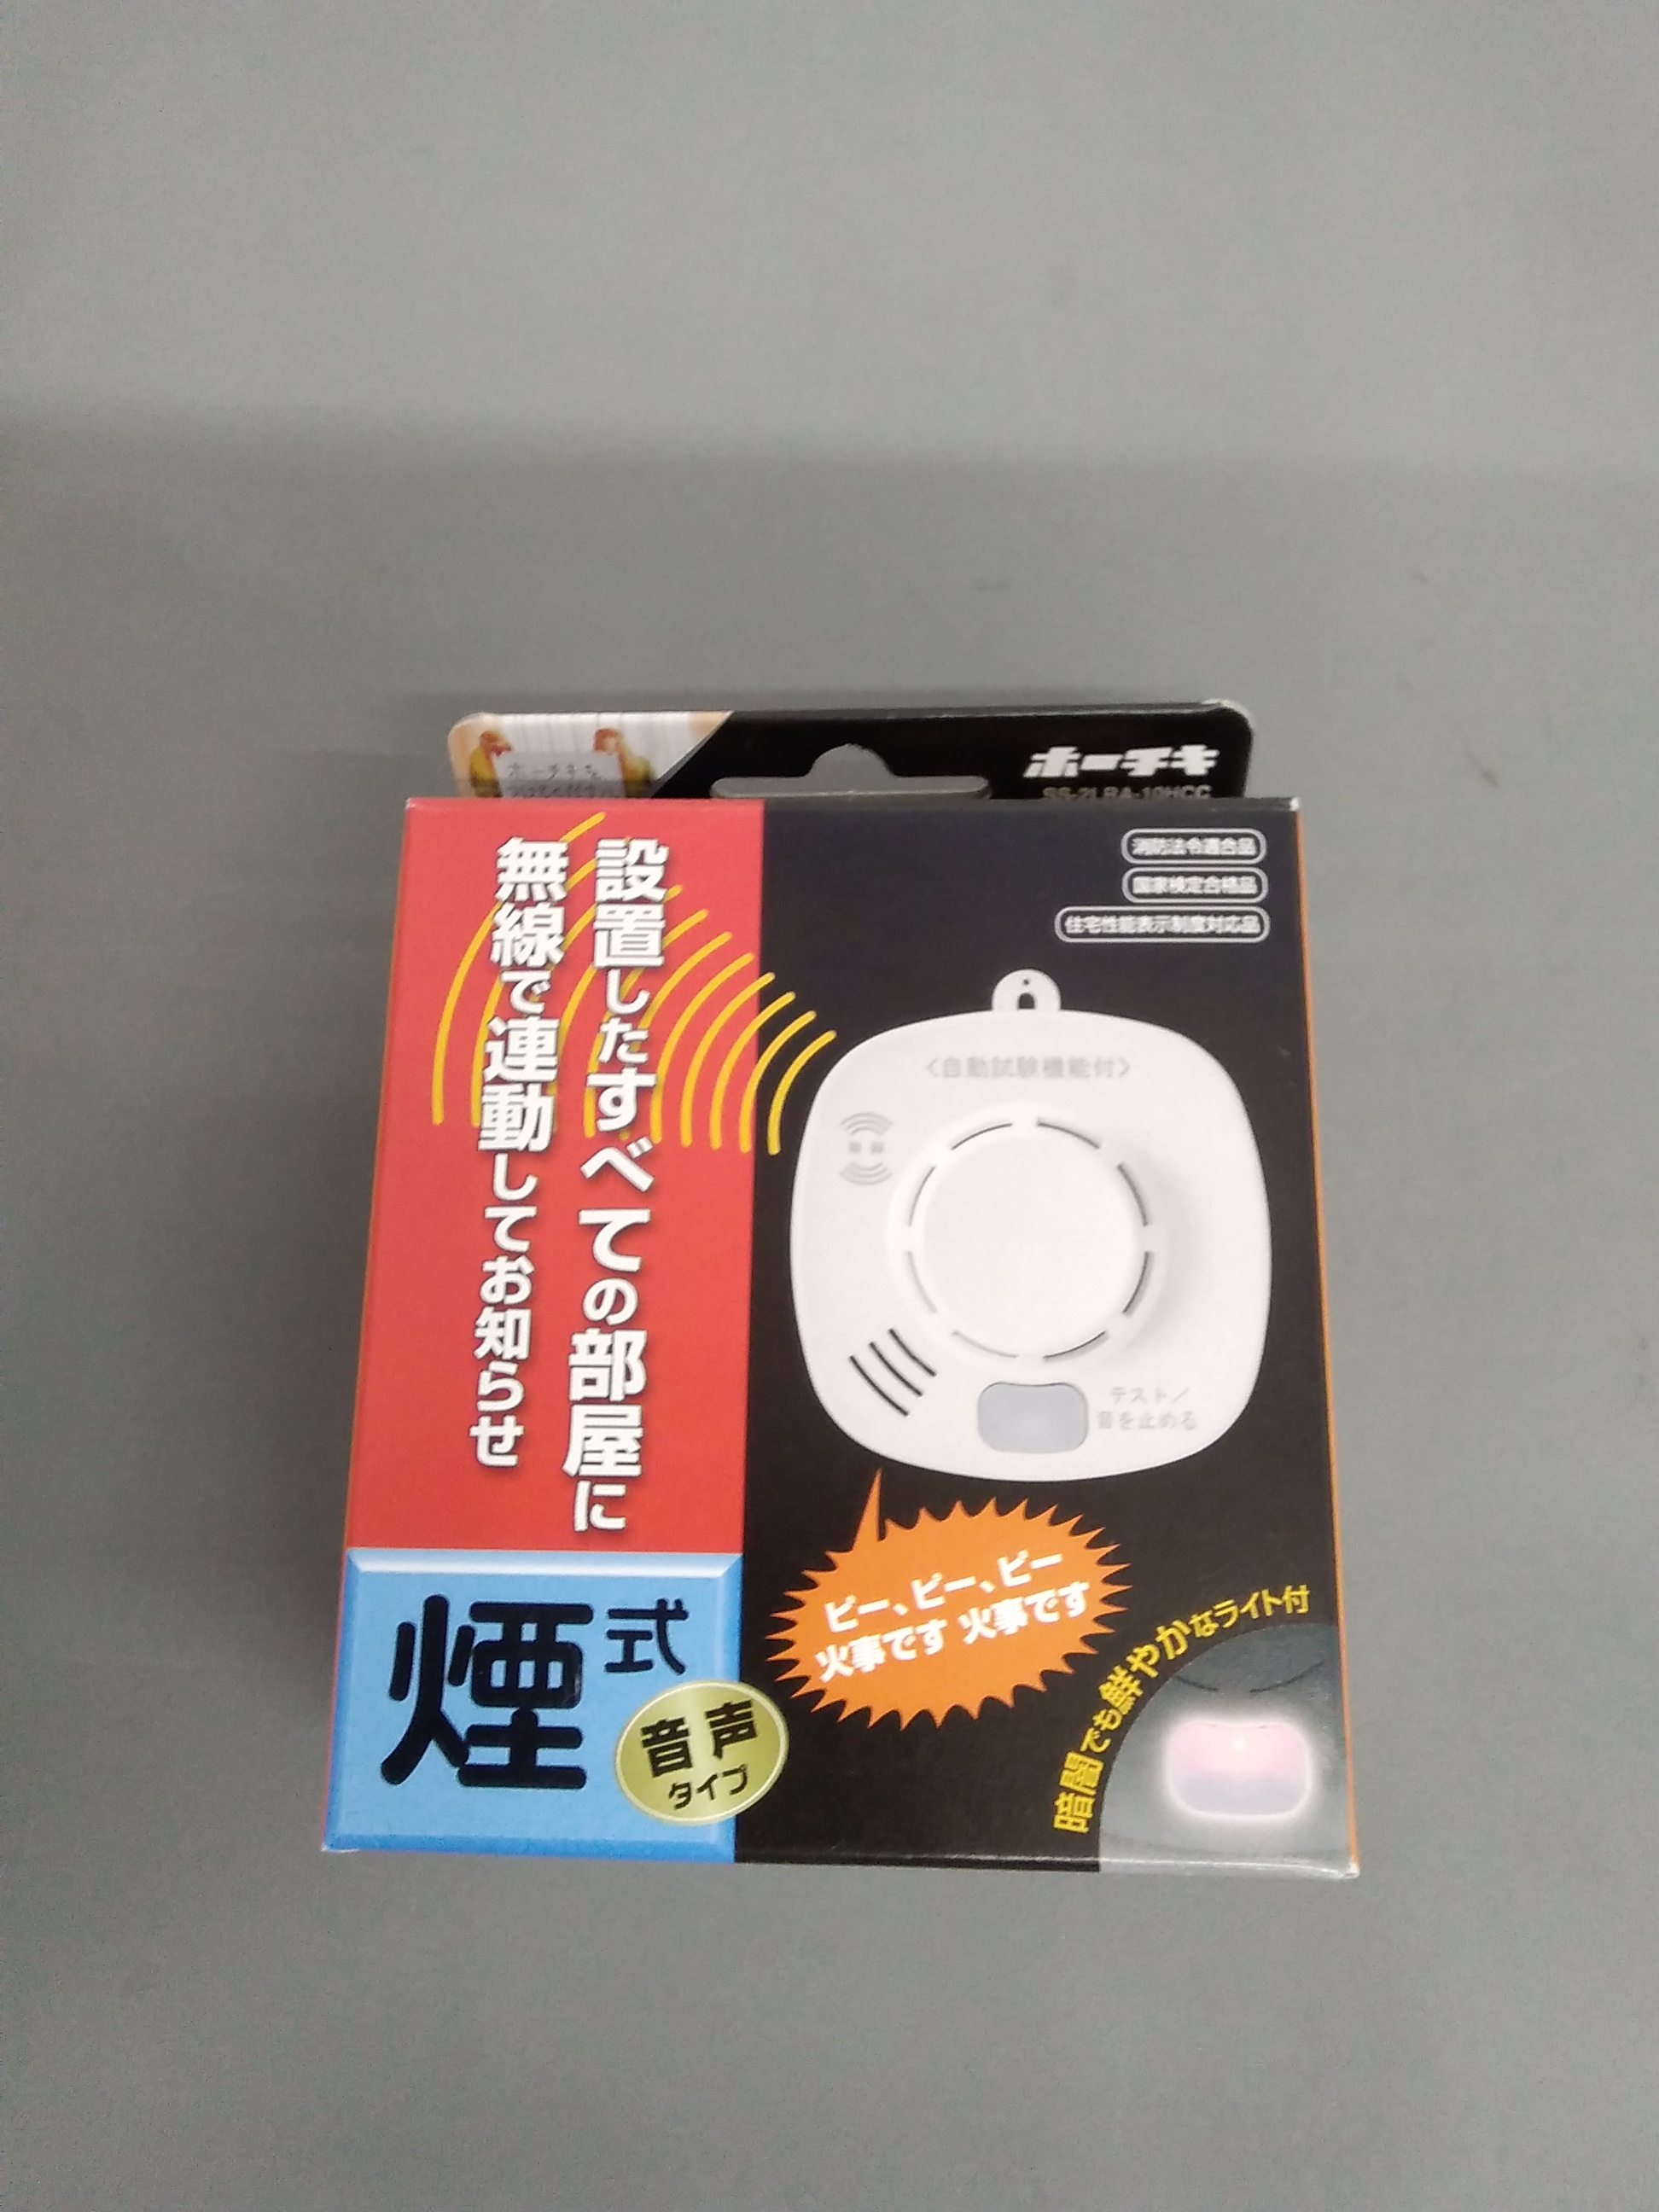 火災警報器|ホーチキ株式会社